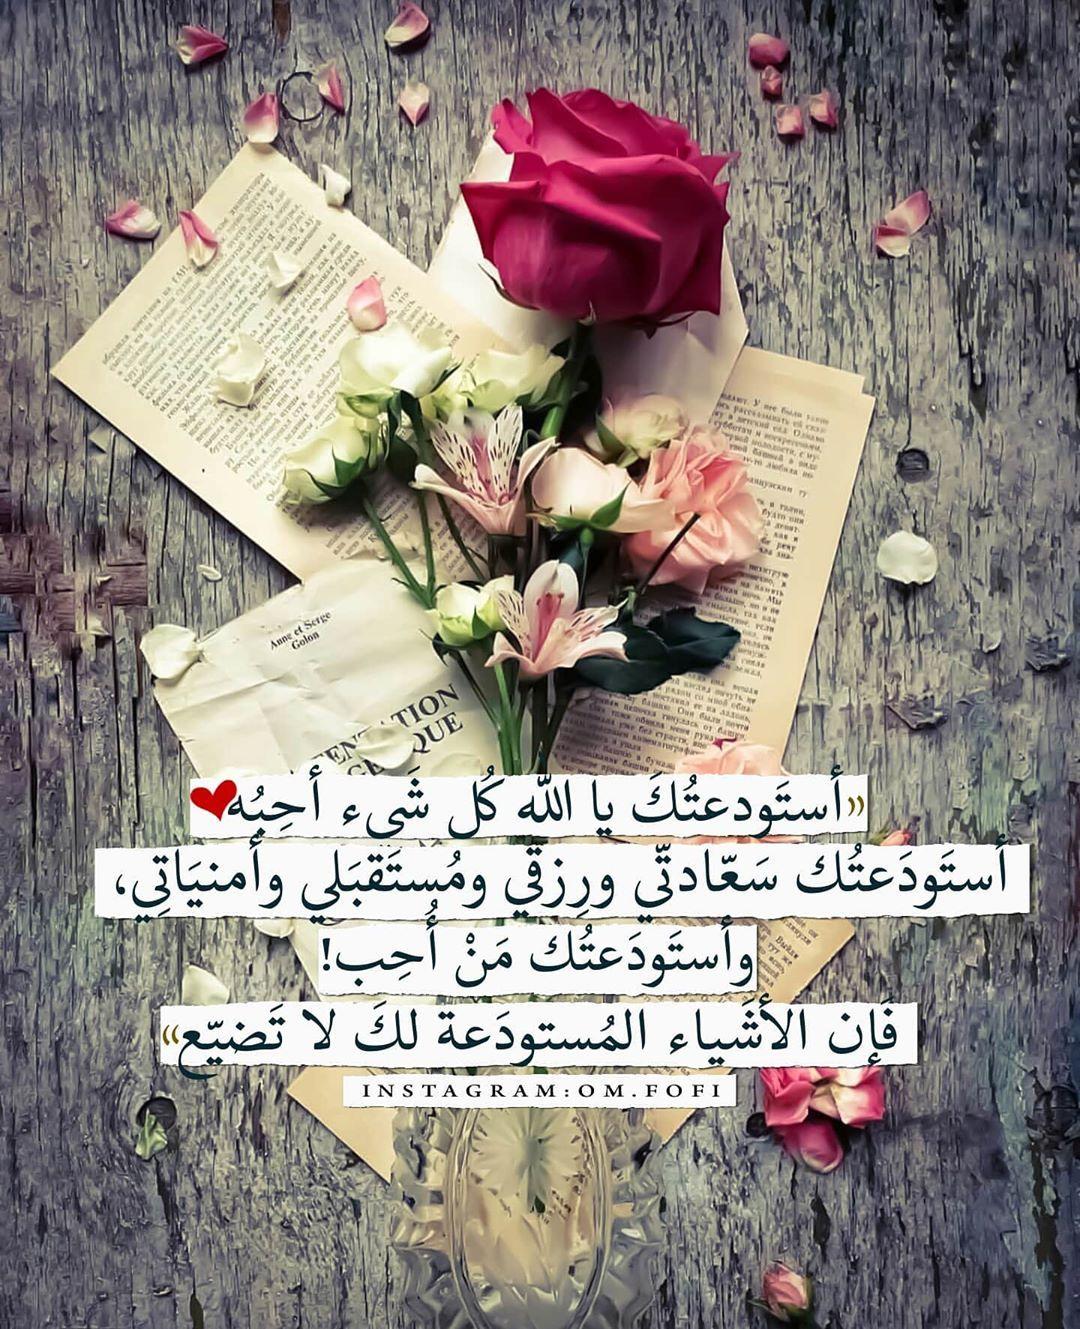 D3signer On Instagram أستودعتك يا الله ك ل شيء أحبه استودعتك سعادتي ورزقي ومستقبلي وأمني Islamic Caligraphy Art Islamic Pictures Islamic Caligraphy